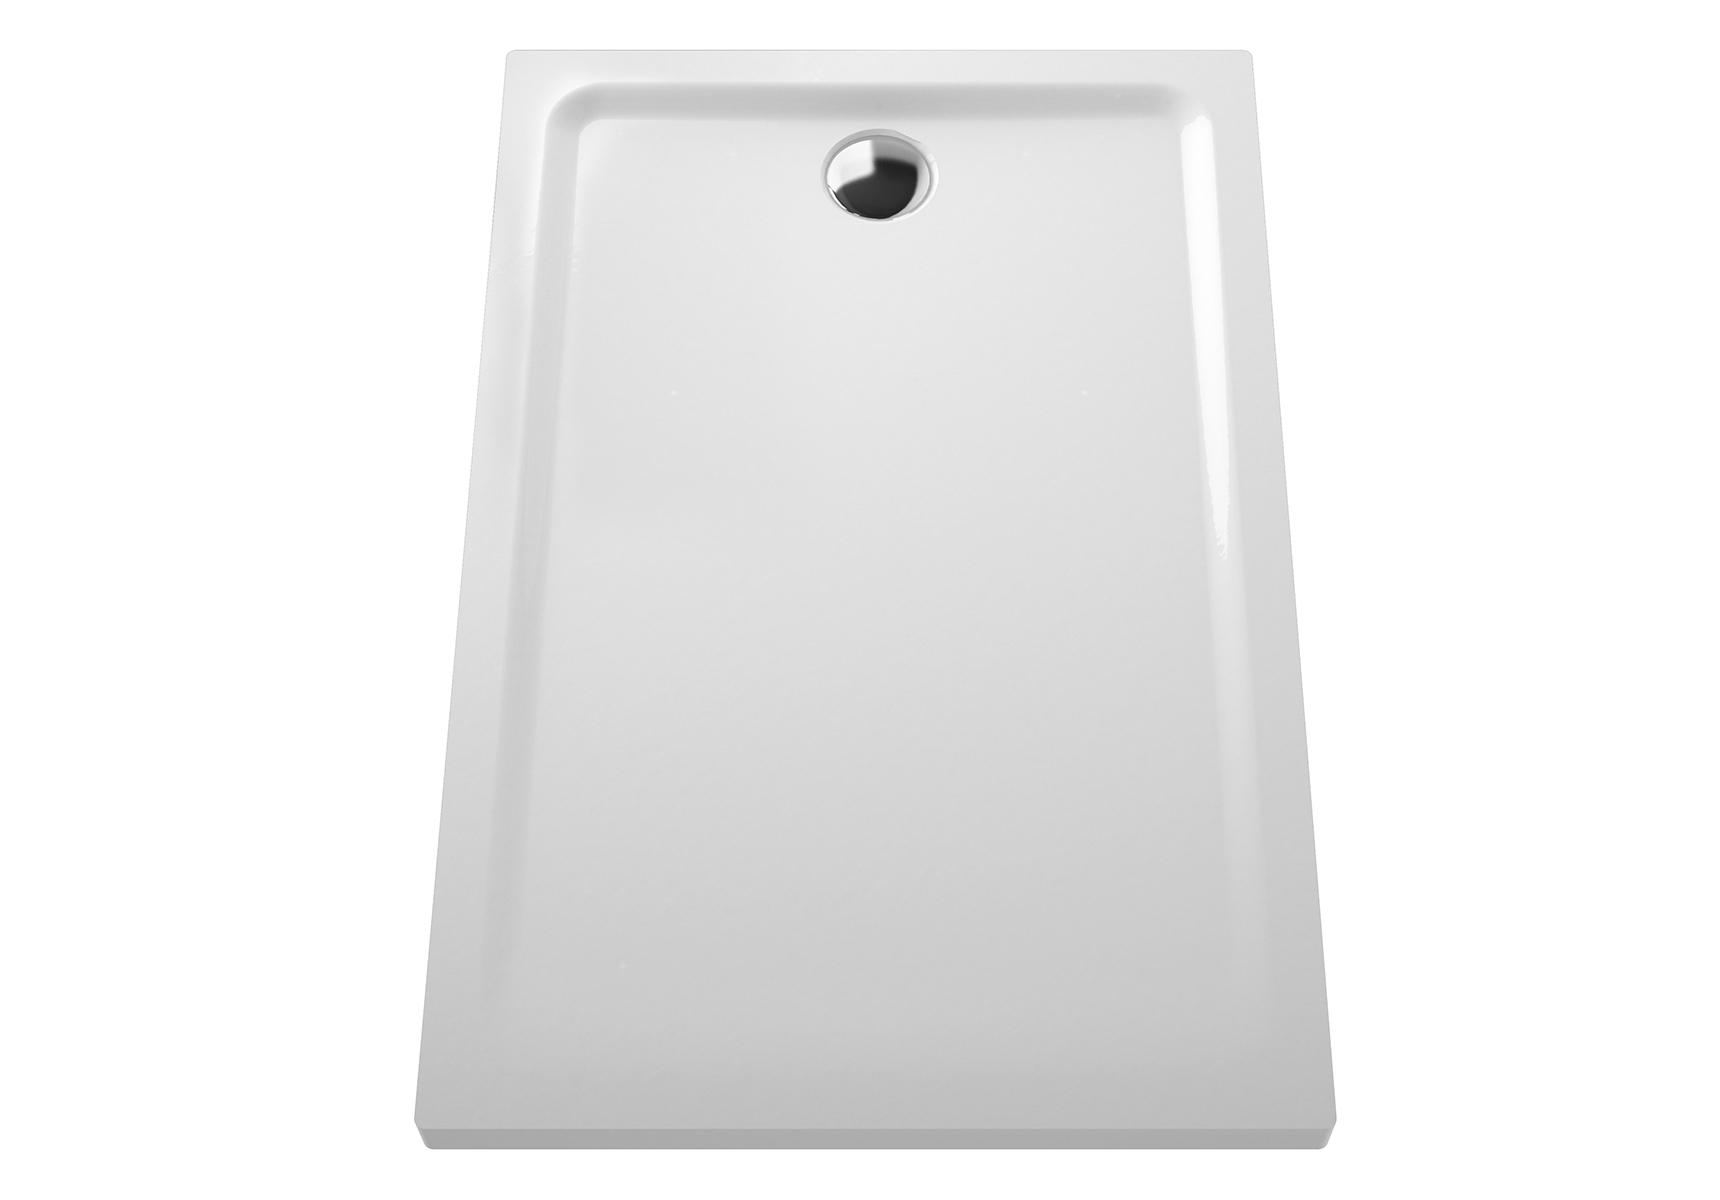 Arkitekt receveur à encastrer ou à poser extra plat, 120  x  80 cm